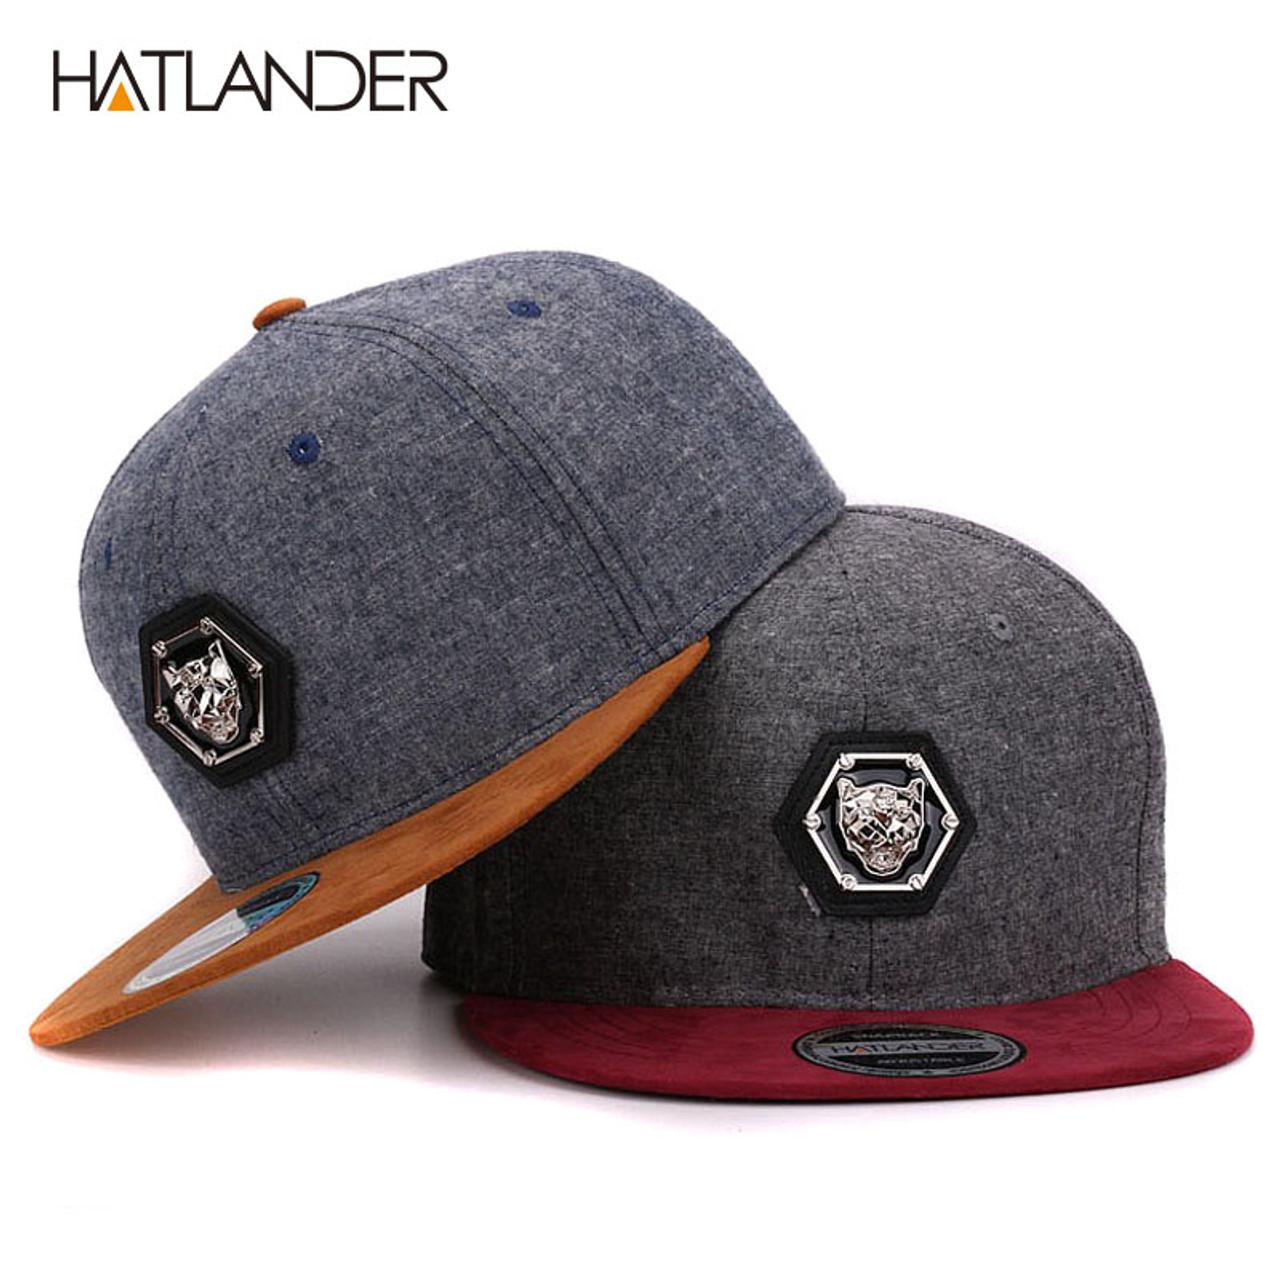 4b4eff90615 HATLANDER branded adjustable baseball caps women Kpop hip hop cap outdoor  flat brim mens hats gorras planas snapbacks for adult - OnshopDeals.Com